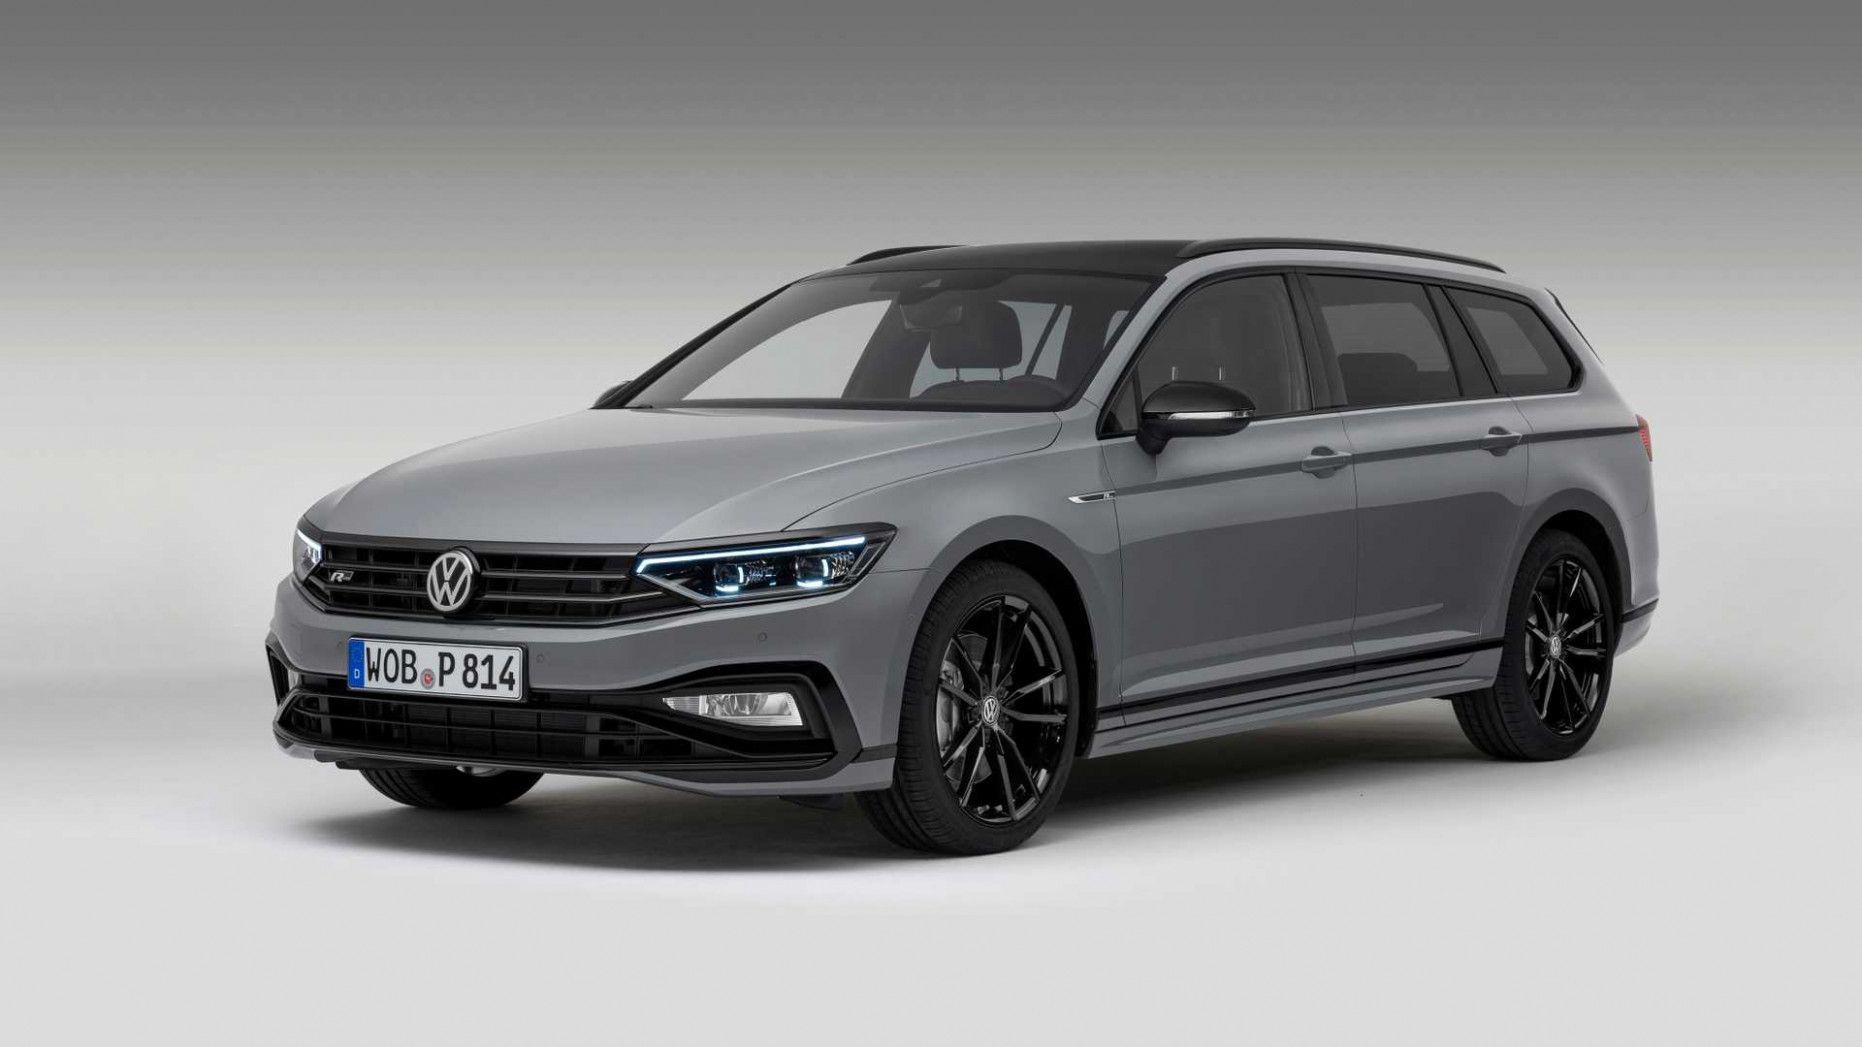 2020 Volkswagen Passat Wagon In 2020 Jetta Wagon Vw Passat Vw Wagon